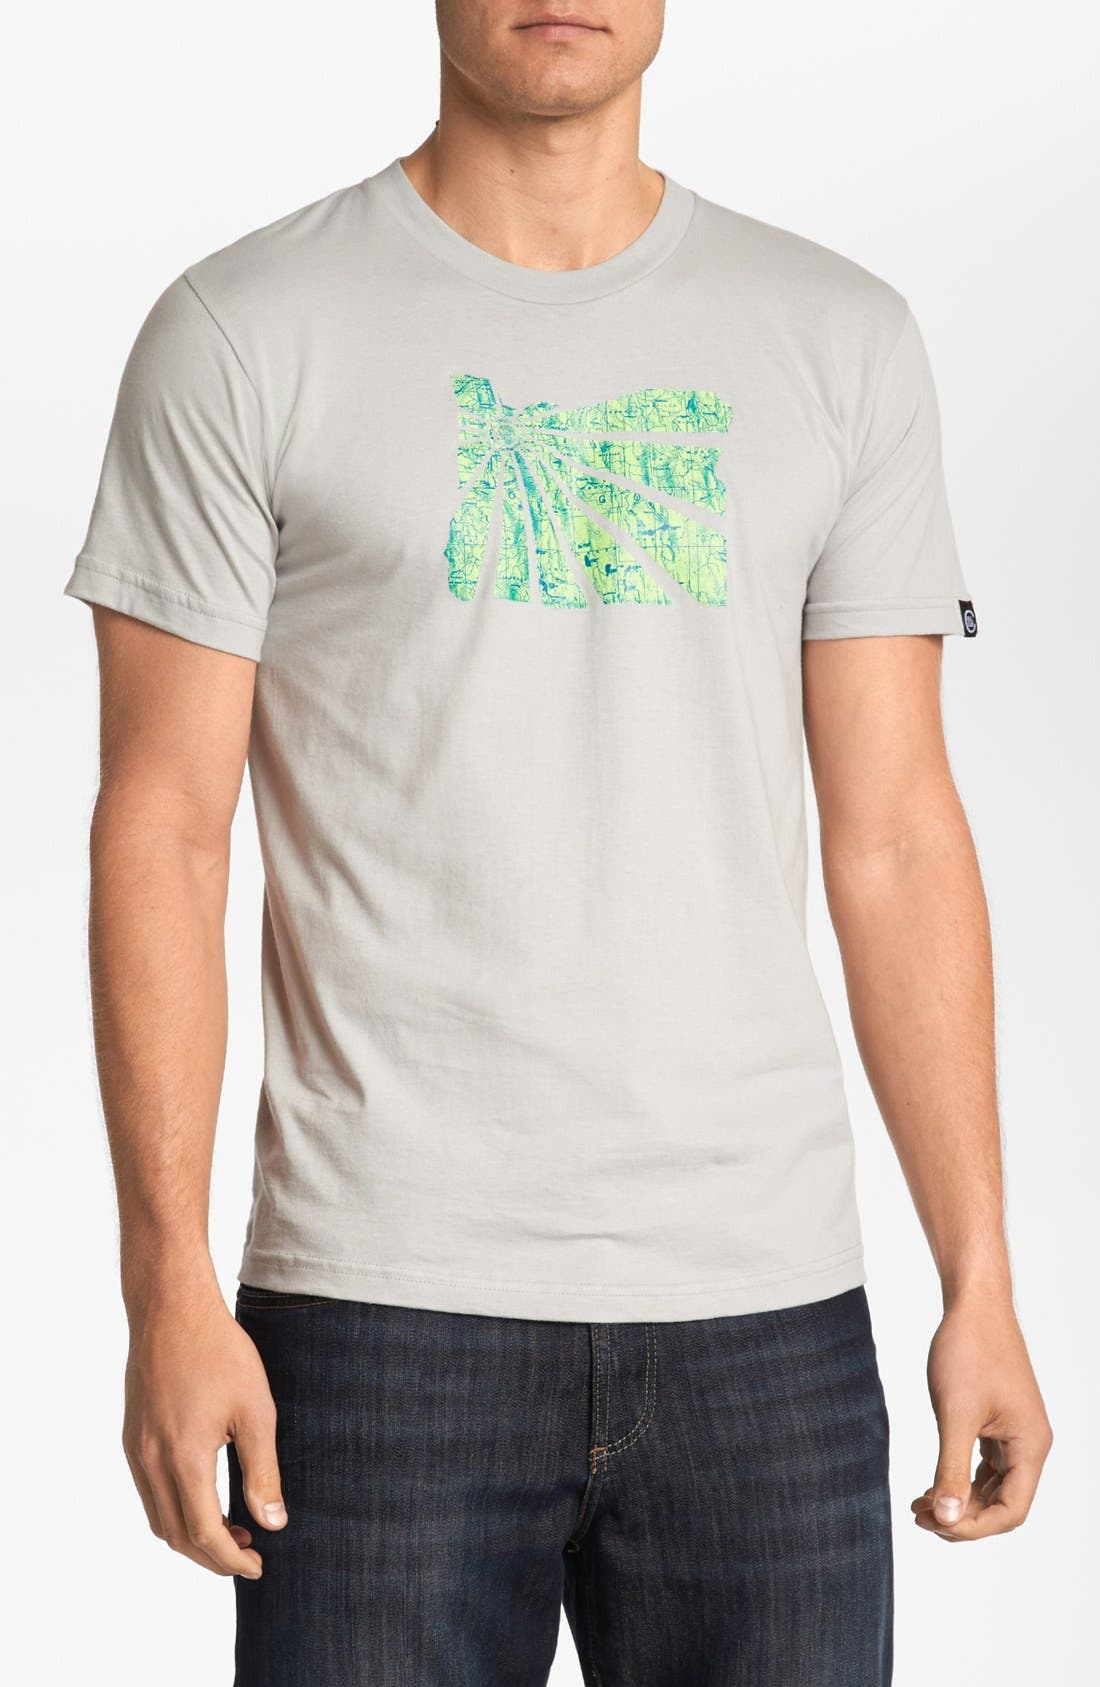 CASUAL INDUSTREES,                             'OR Brah Map' T-Shirt,                             Main thumbnail 1, color,                             045